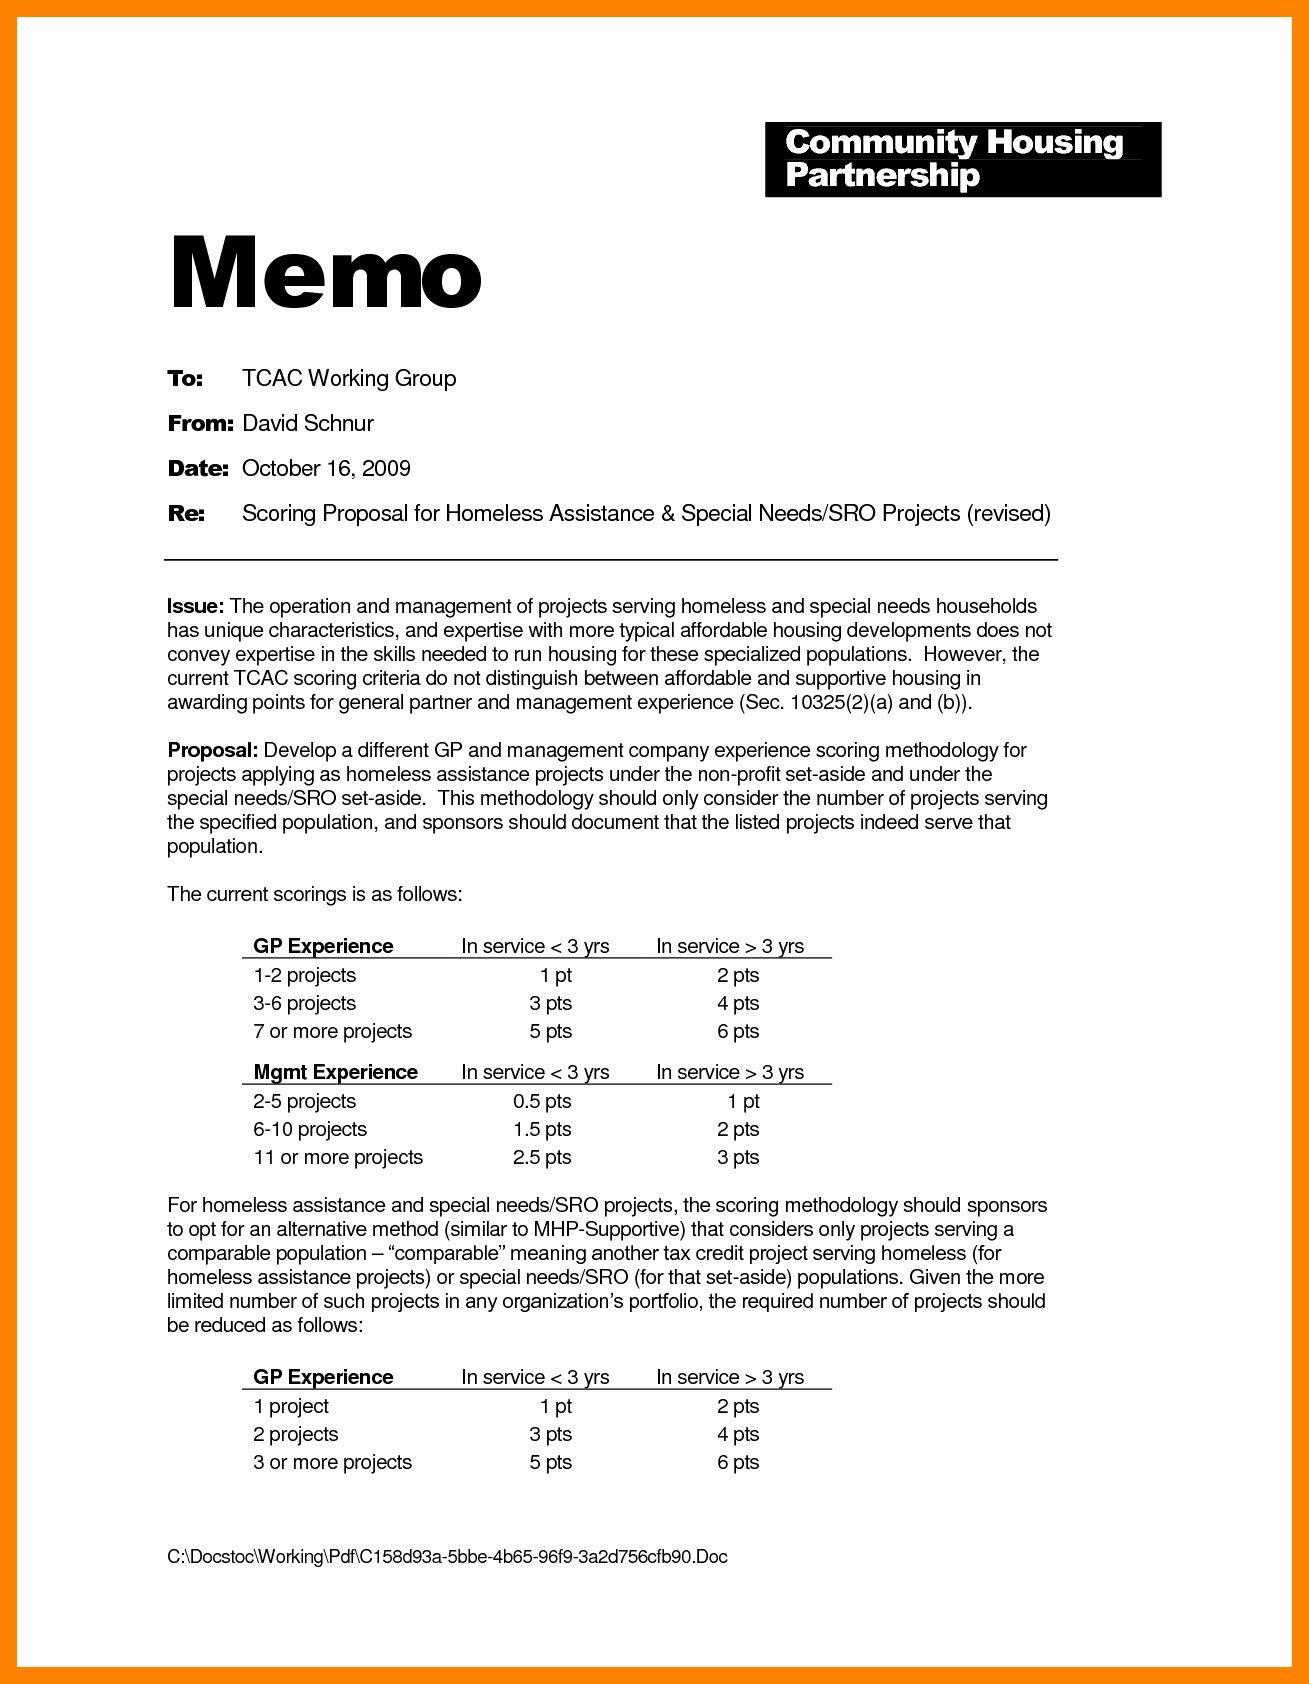 Download Fresh Letterhead Sample for Non Profit at https